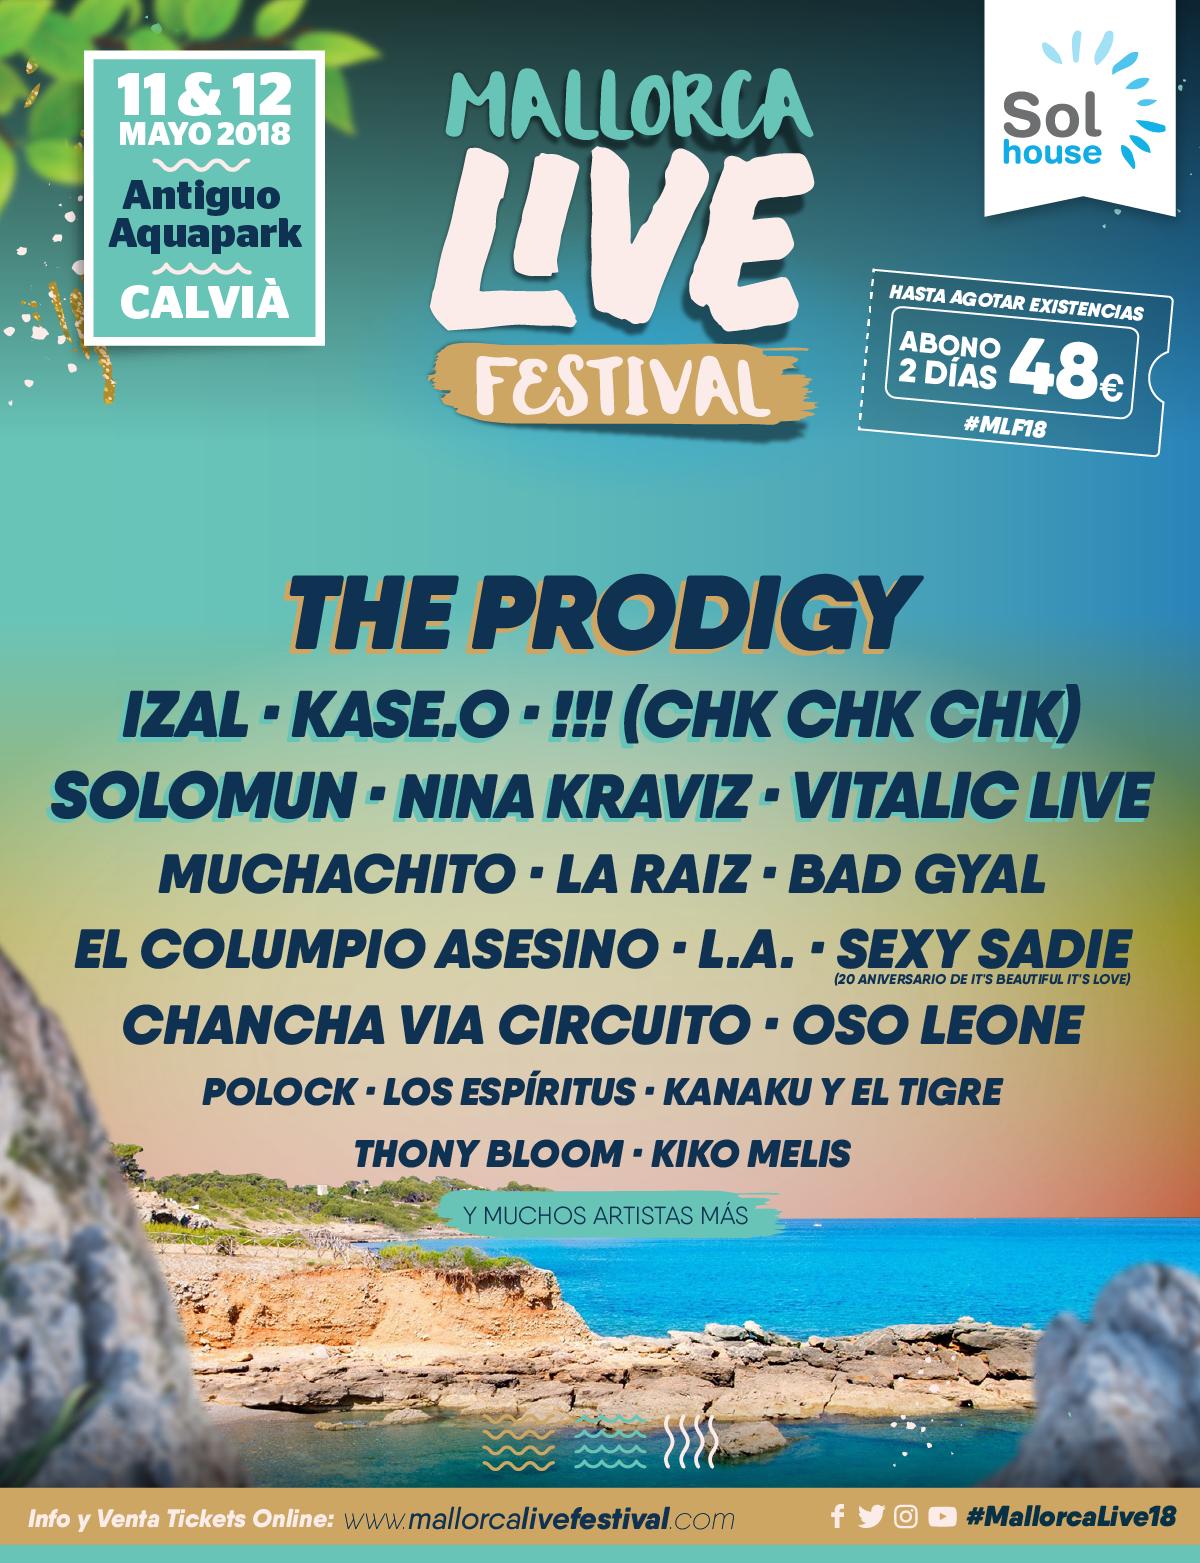 cartel mallorca life festival 2018